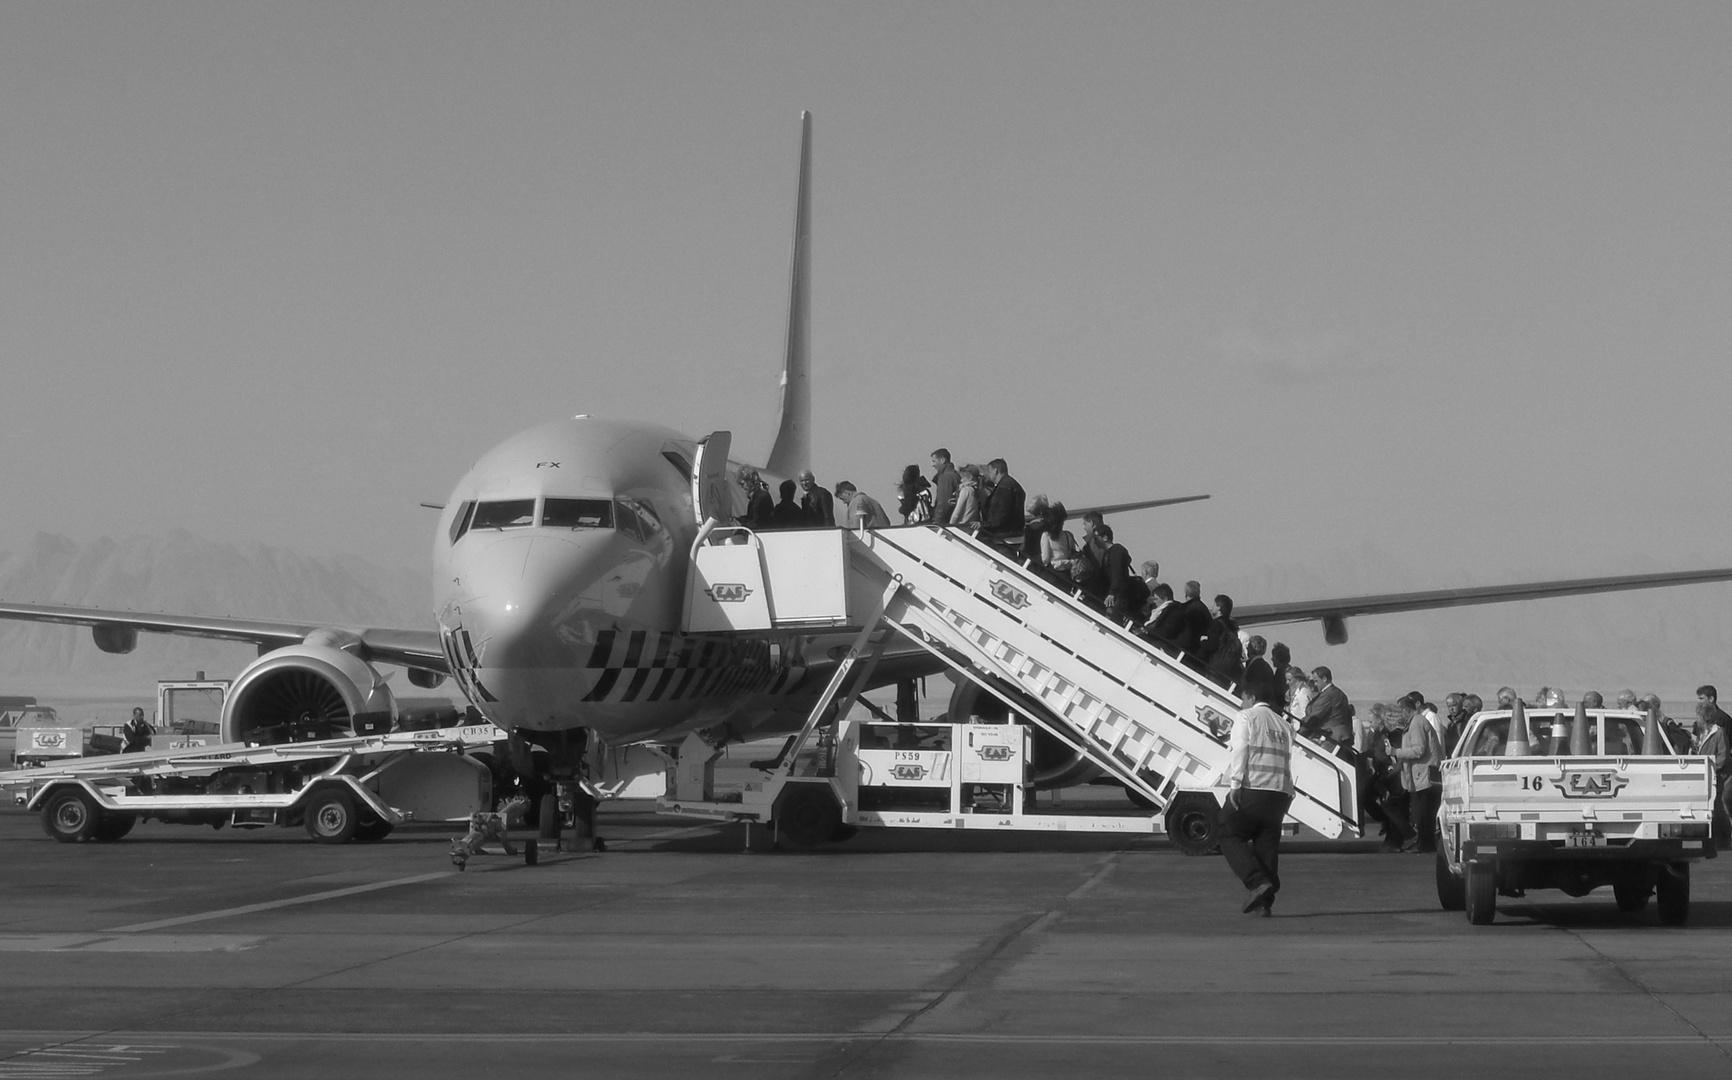 Ein paar geh'n noch... - Abflug aus Hurghada